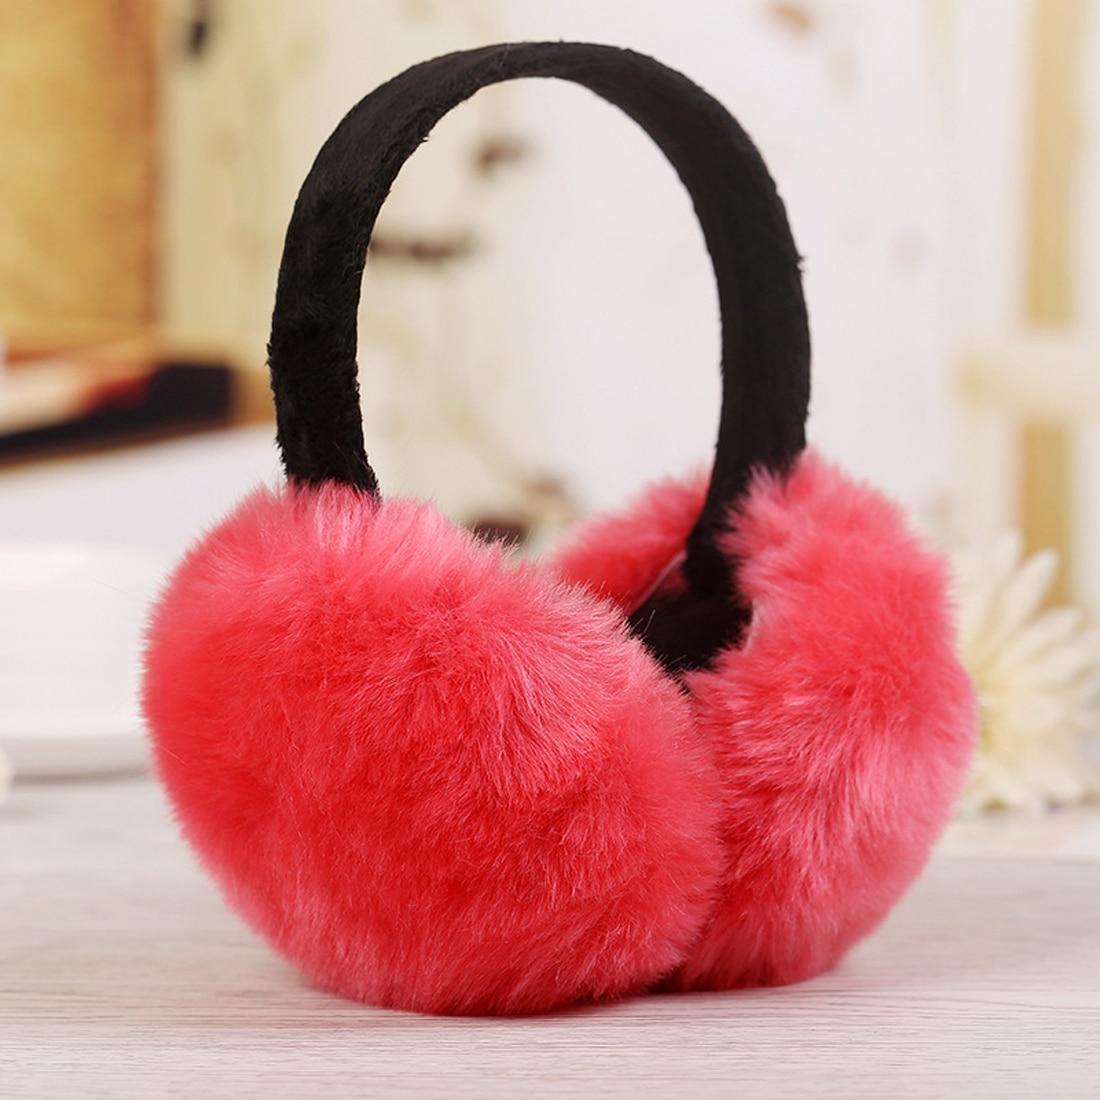 Hot Winter Women Men Earmuffs Lovers Ear Warmer Imitation Rabbit Plush Plain Teenage Earmuffs Student Girl Ear Muffs